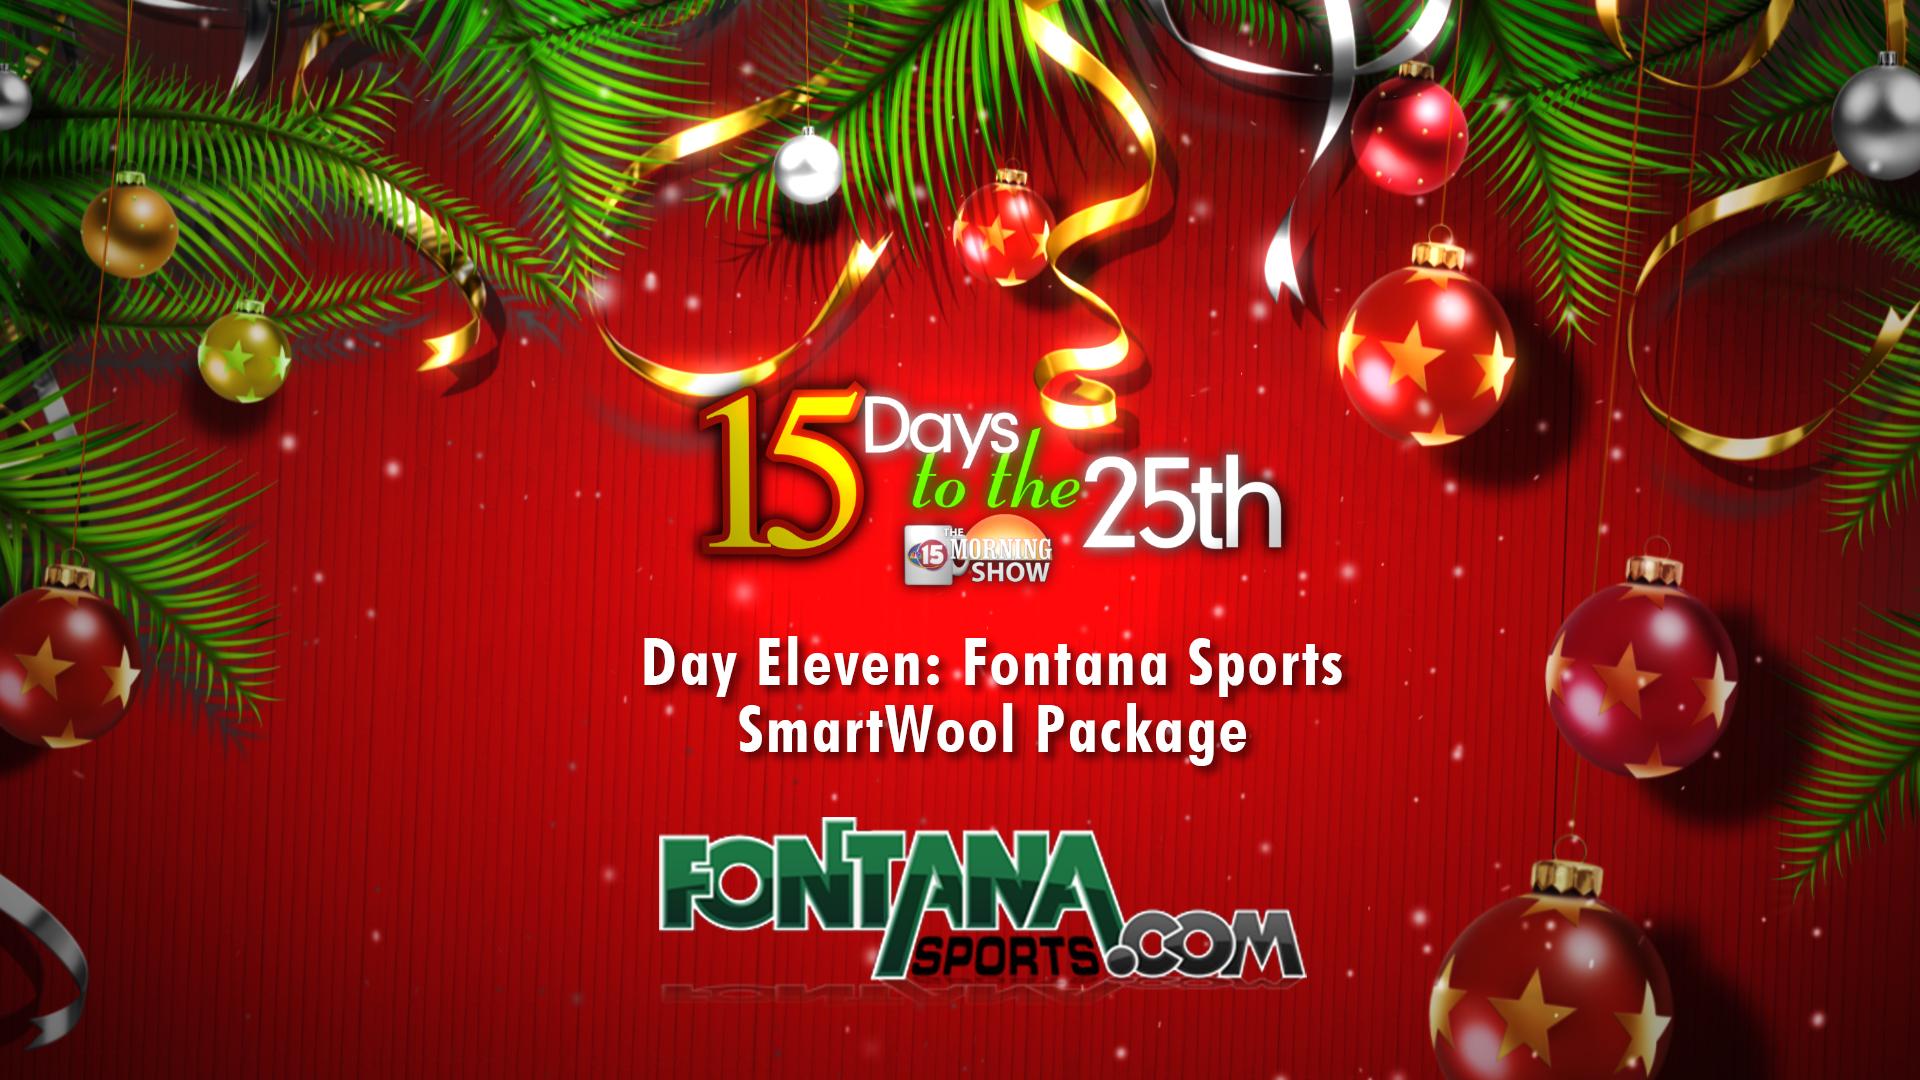 NBC 15 Days to Christmas | Fontana Sports